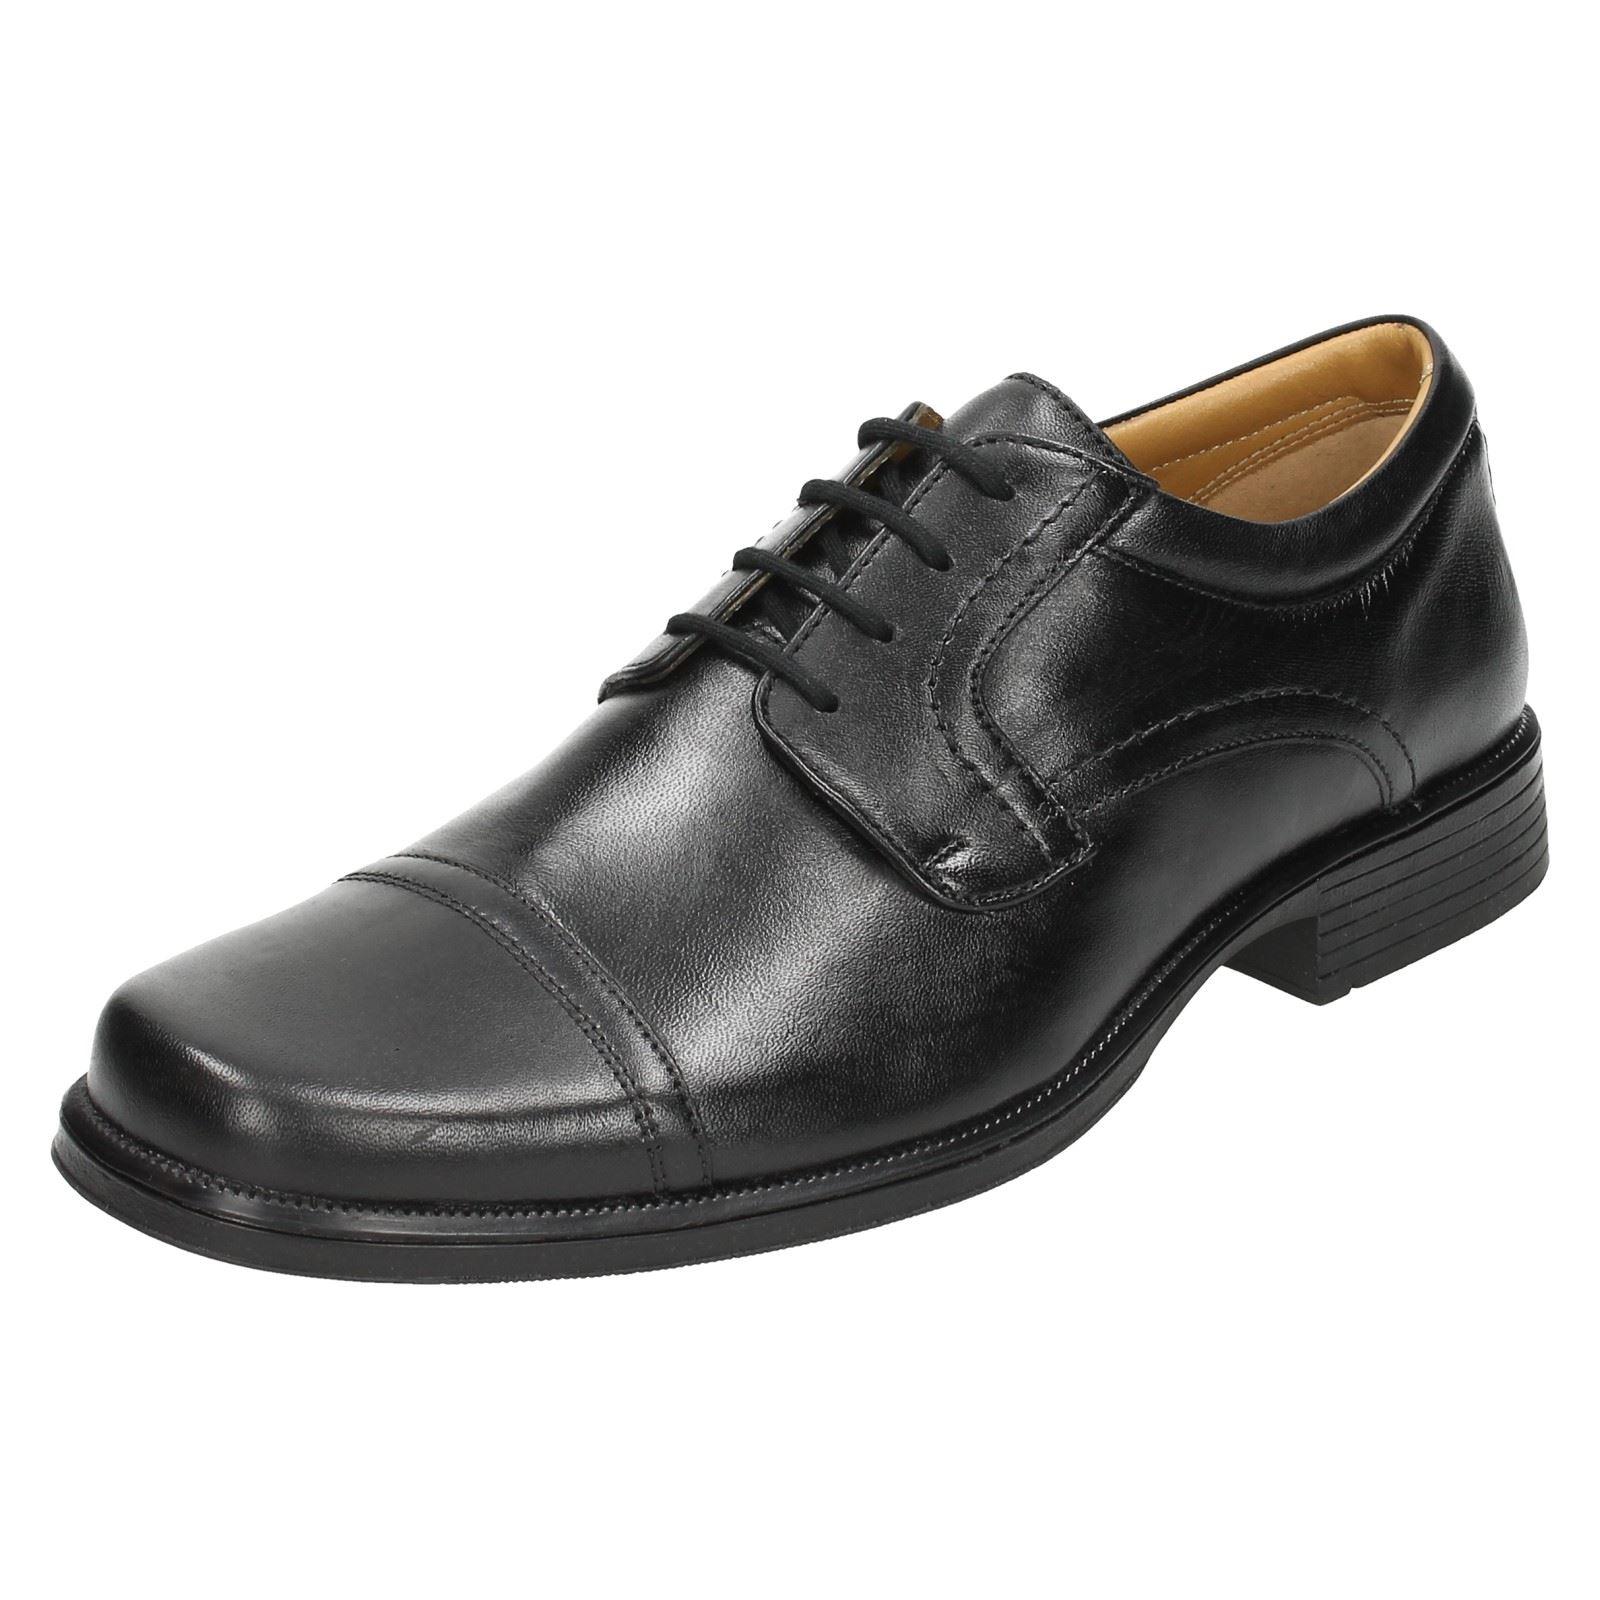 Herren Clarks Formal Lace Up Schuhes 'Hoist 'Hoist Schuhes Cap' 0aeb0c